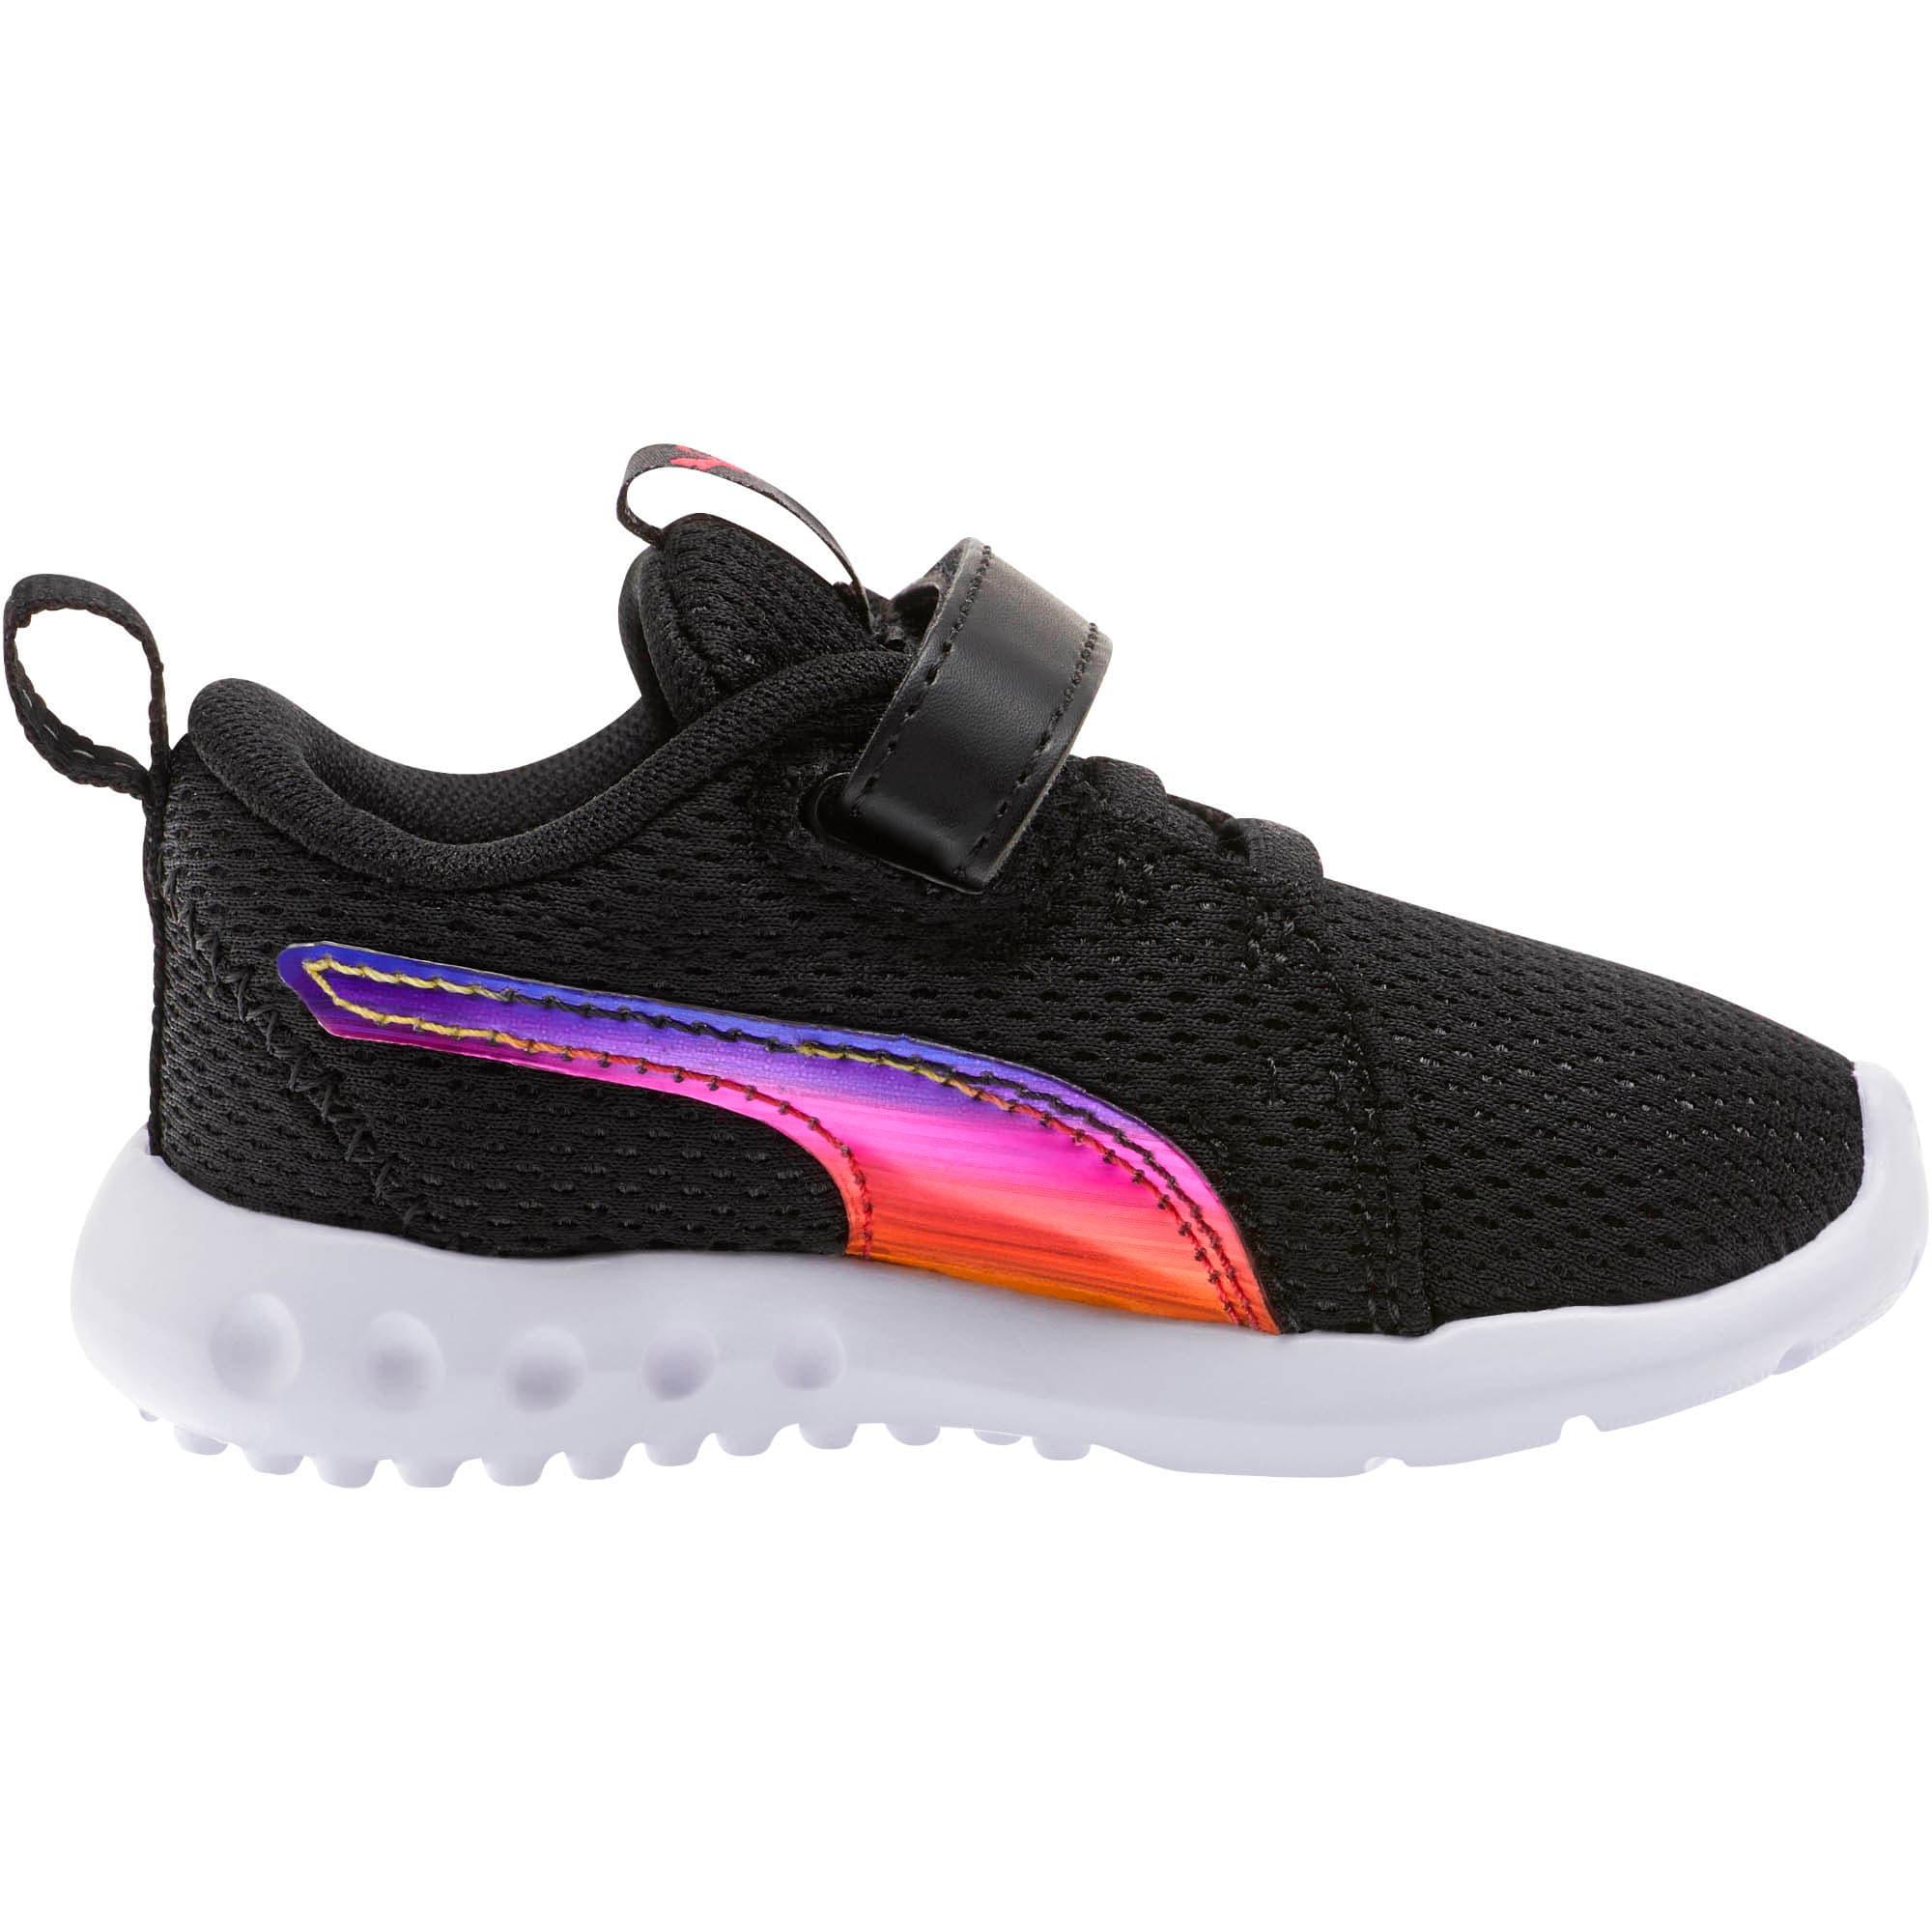 Thumbnail 4 of Carson 2 Iridescent Toddler Shoes, Puma Black-Puma White, medium